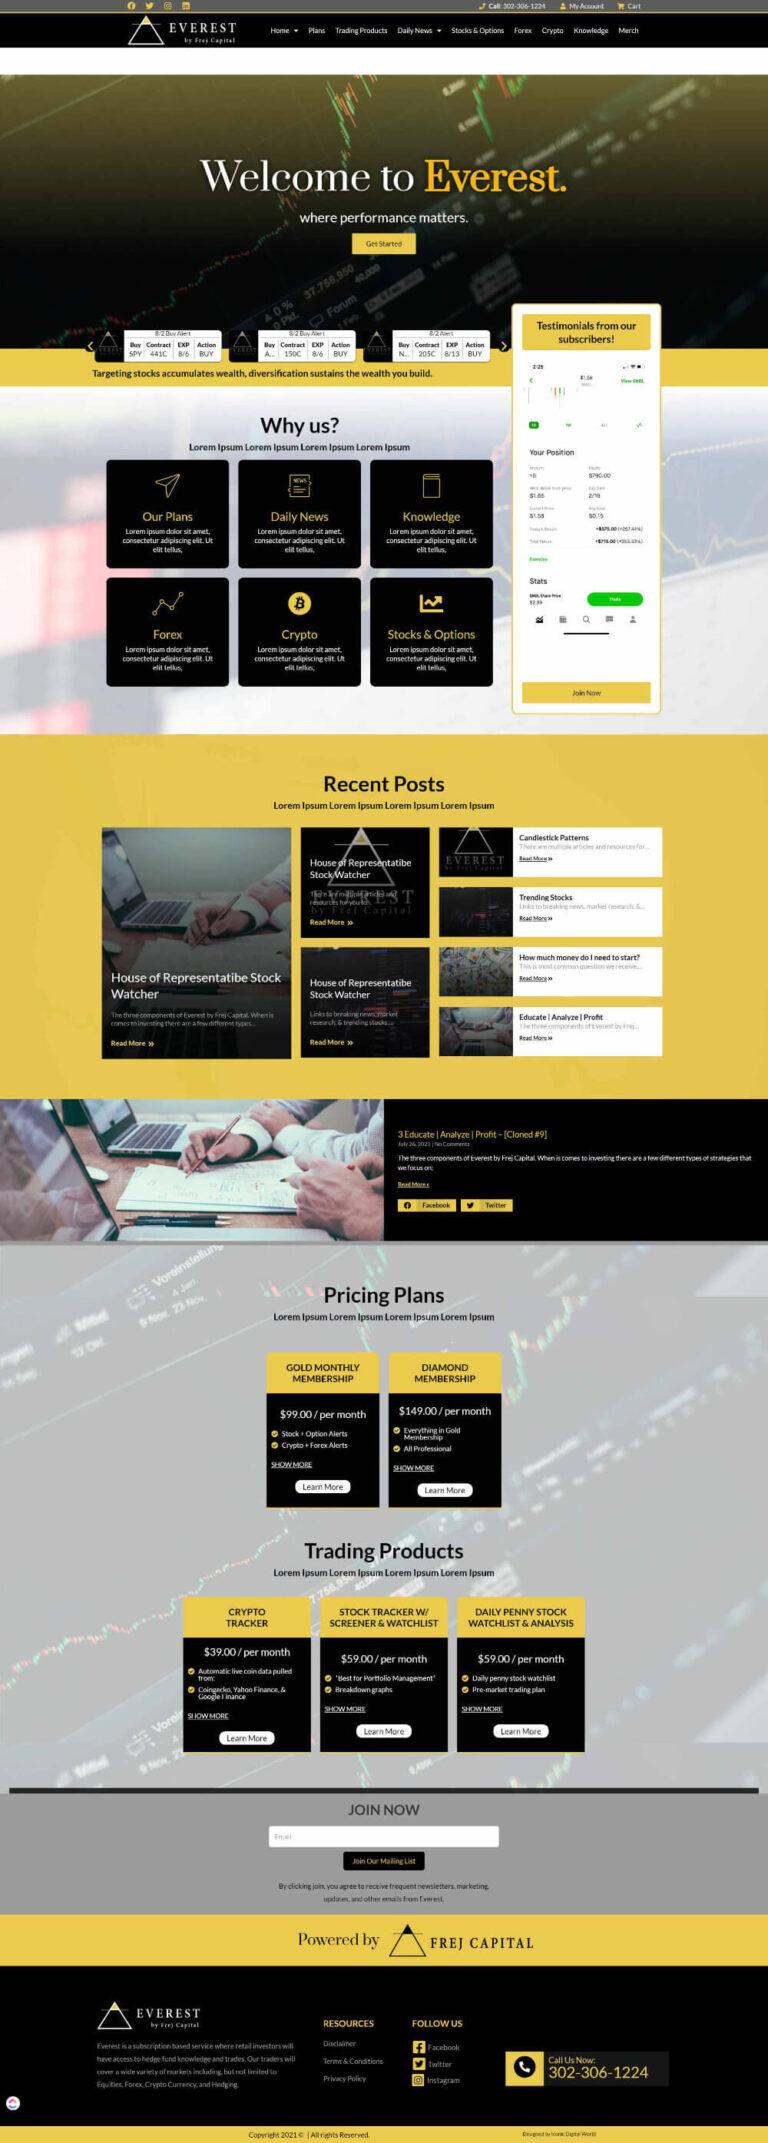 FcEverest Website Design Layout-Home